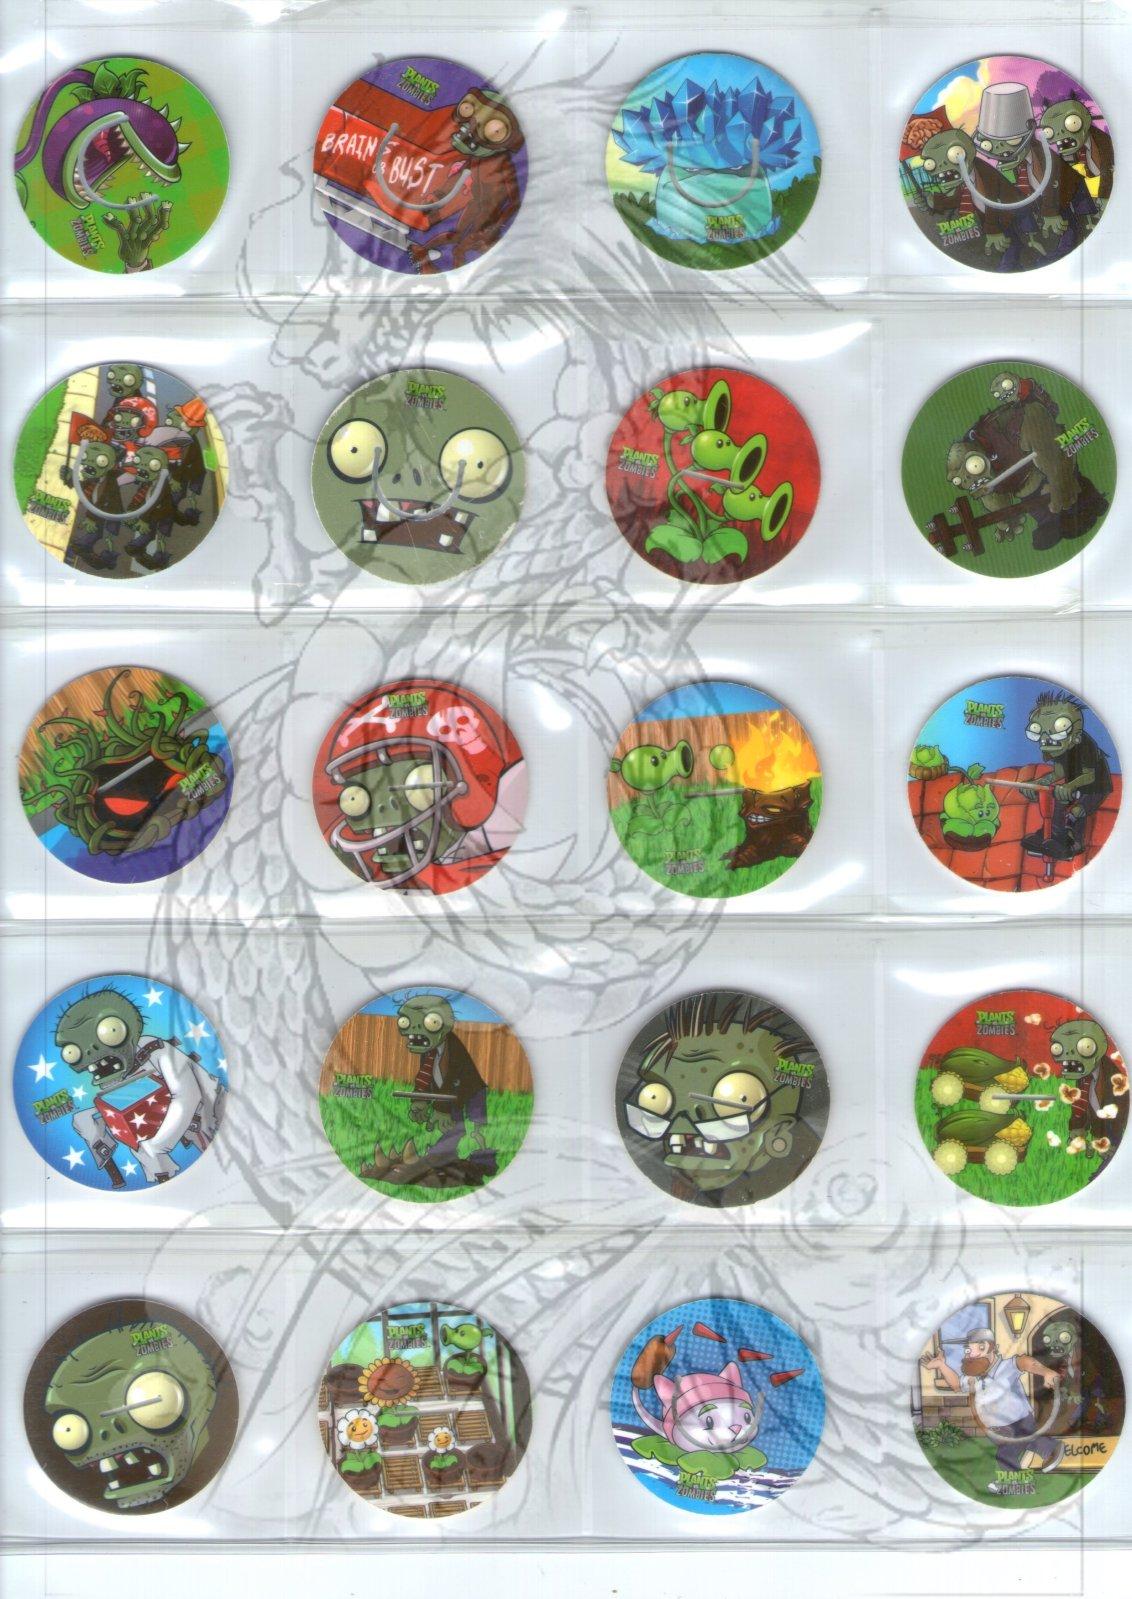 Tazos Plantas Vs Zombies de SABRITAS Jztyfo